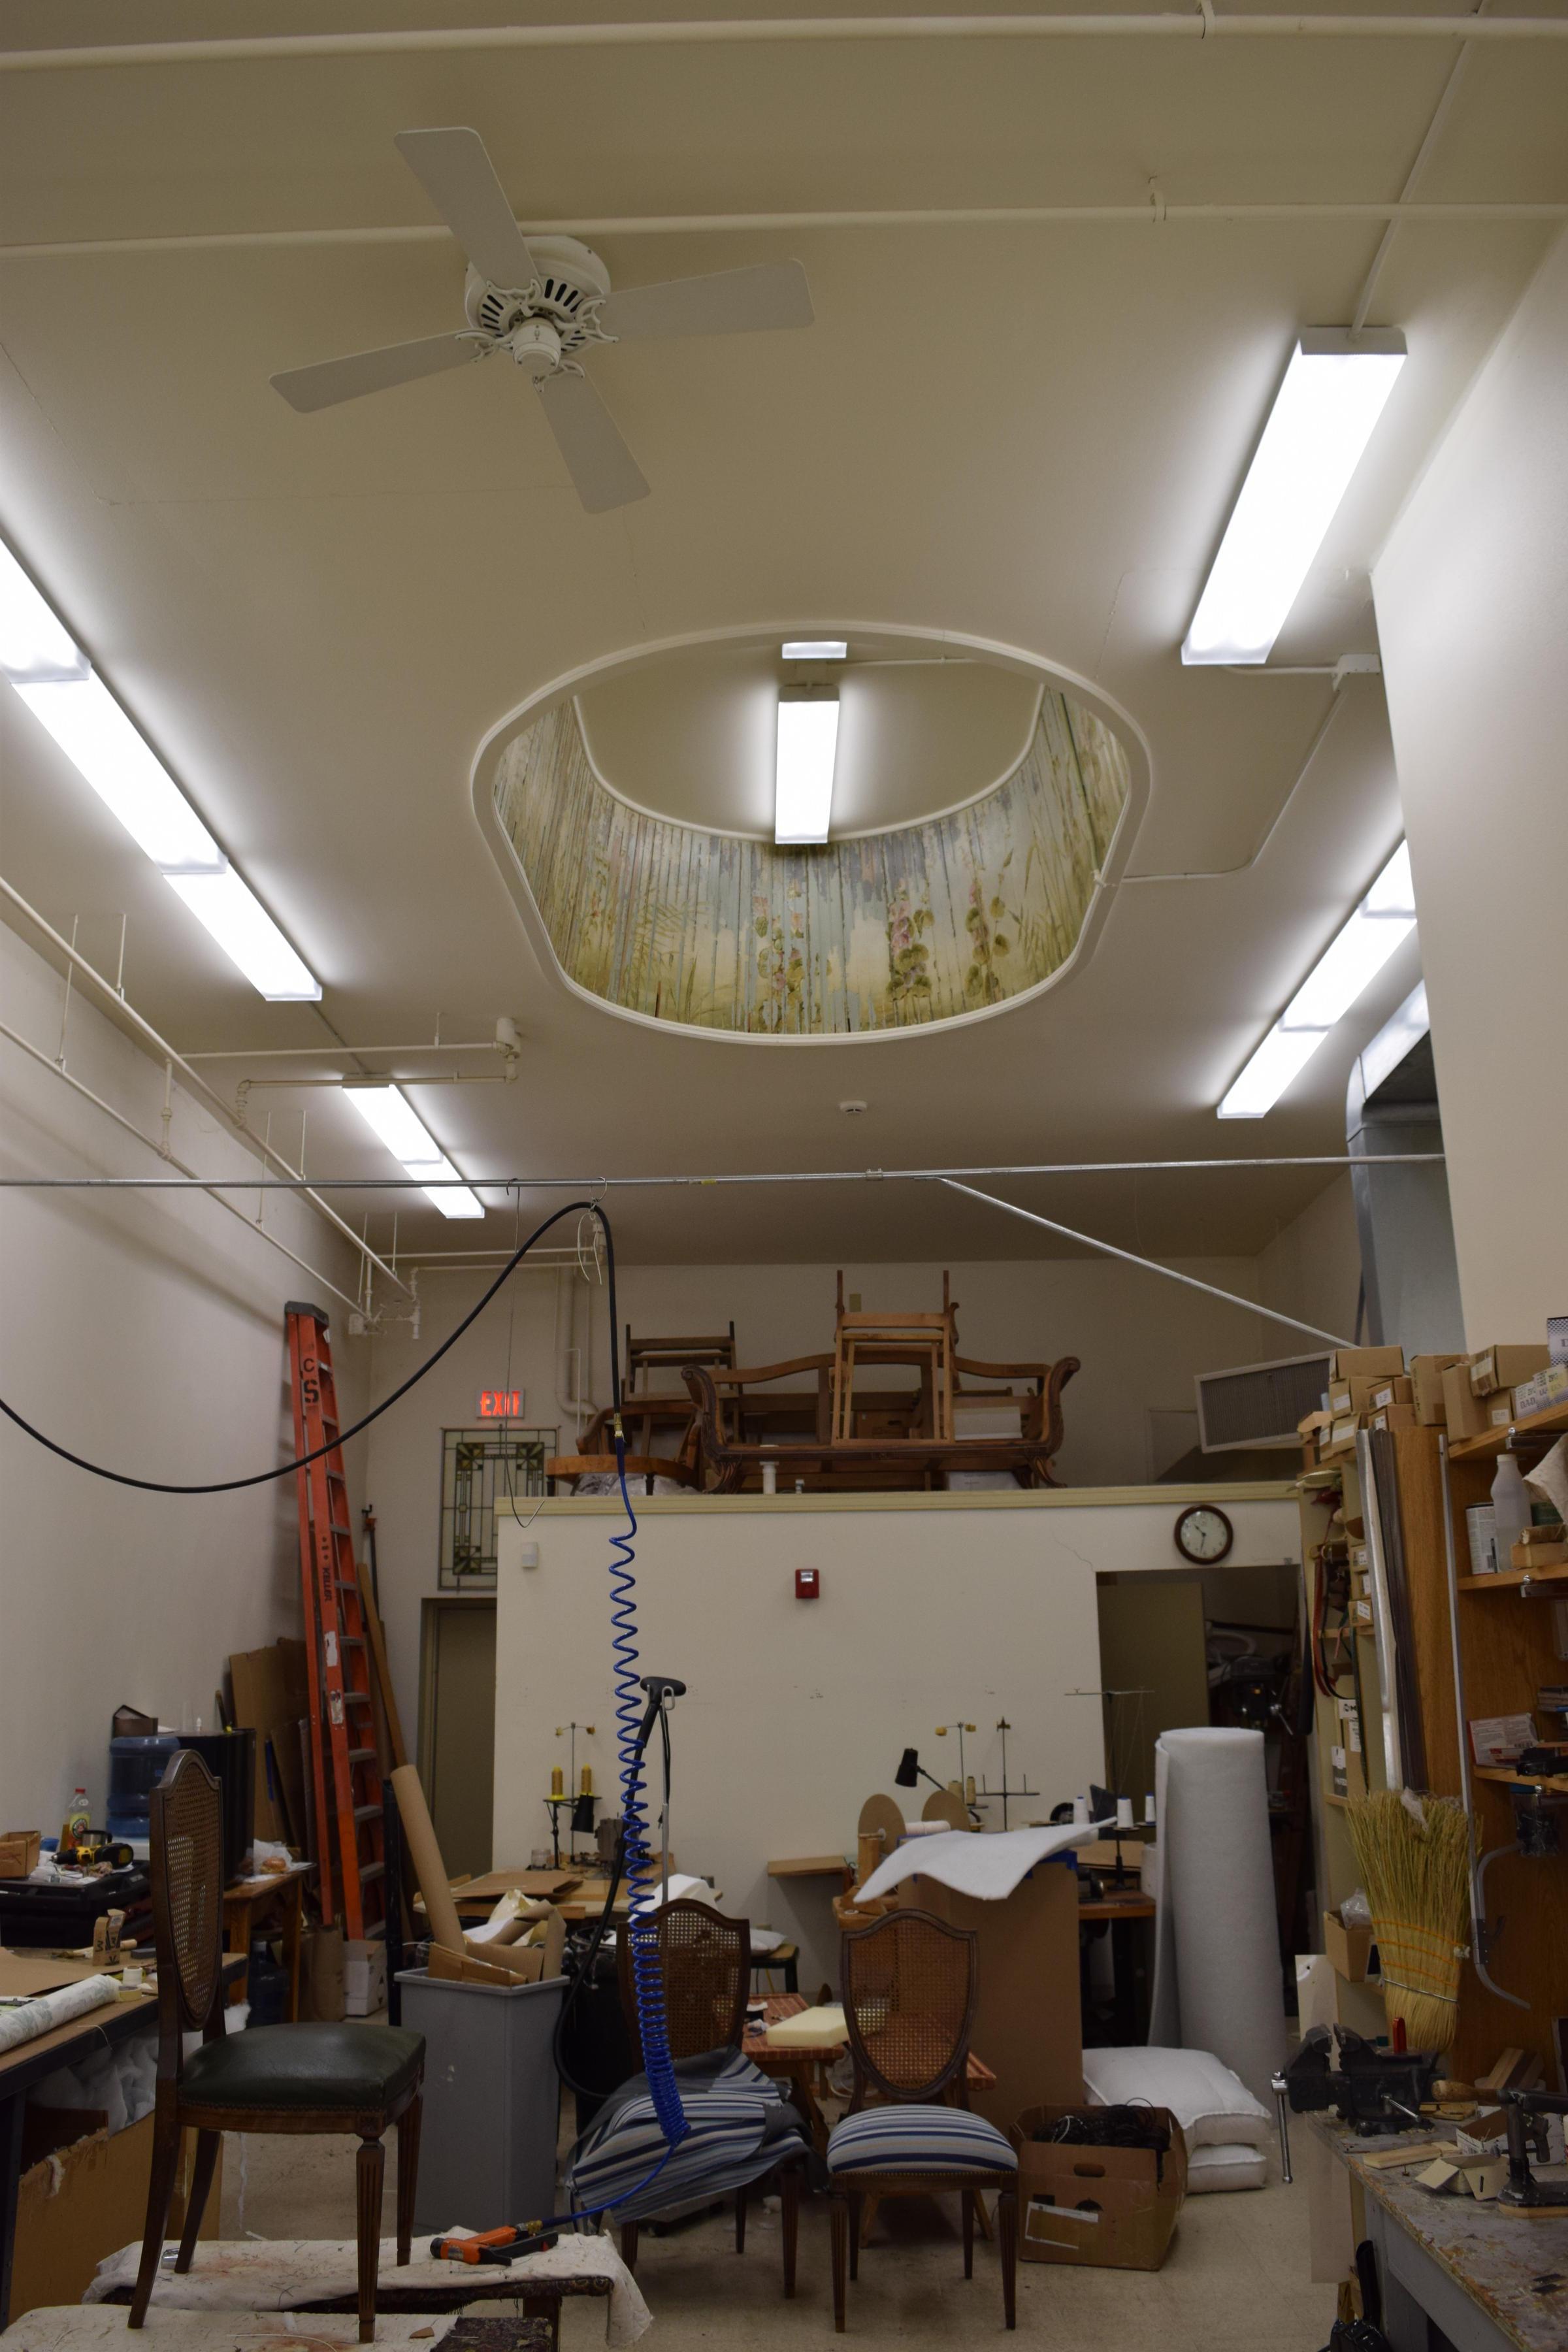 Interior Of Iannellis Custom Shoppe With Original Skylight In Ceiling